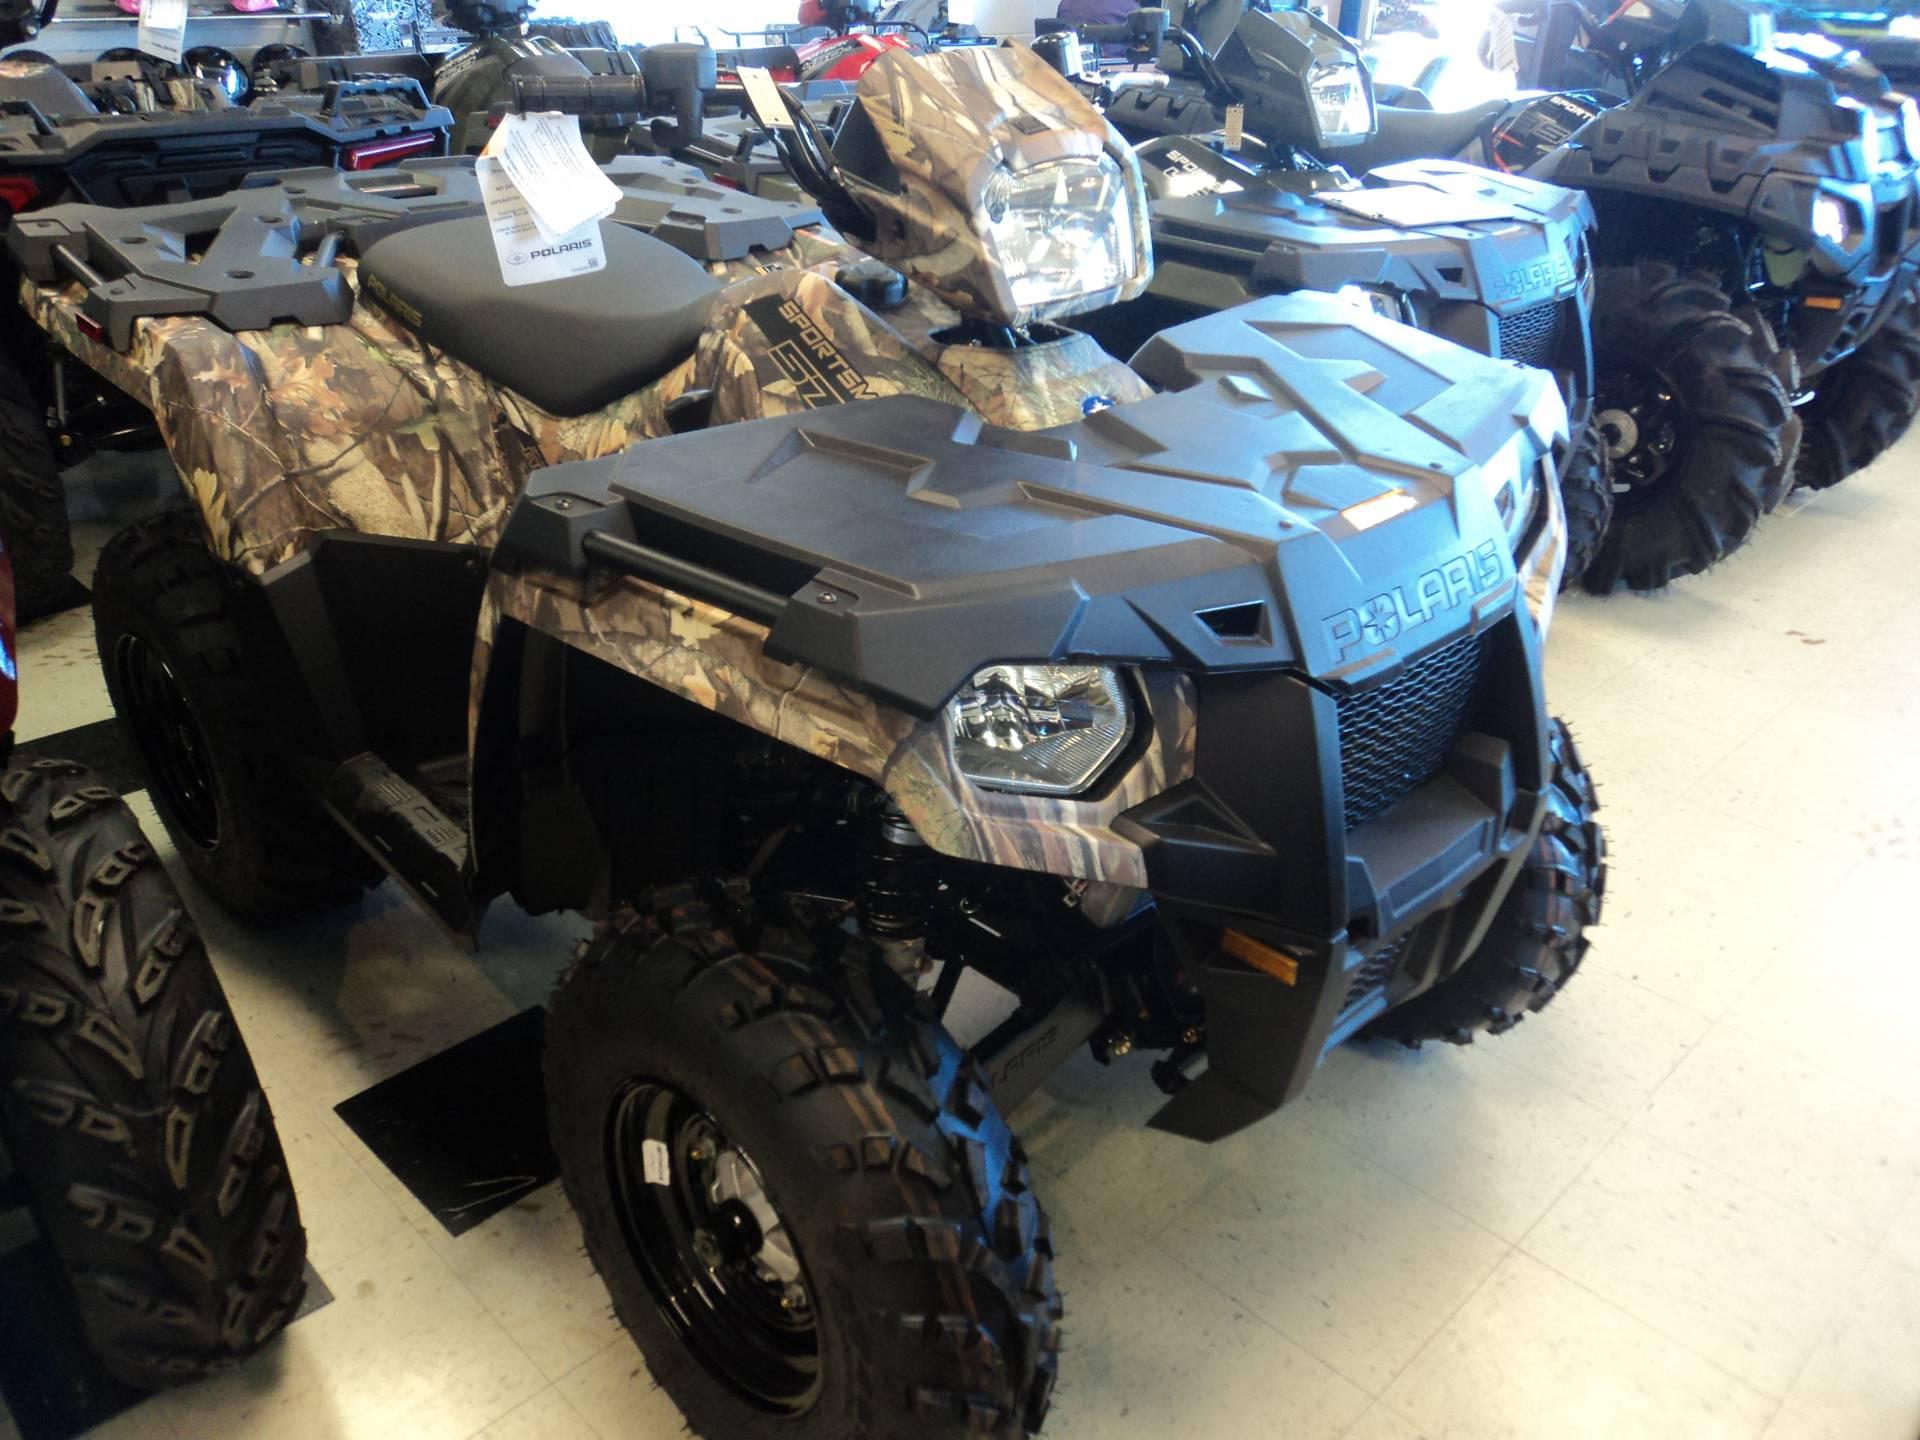 New 2019 Polaris Sportsman 570 EPS Camo ATVs in Forest, VA